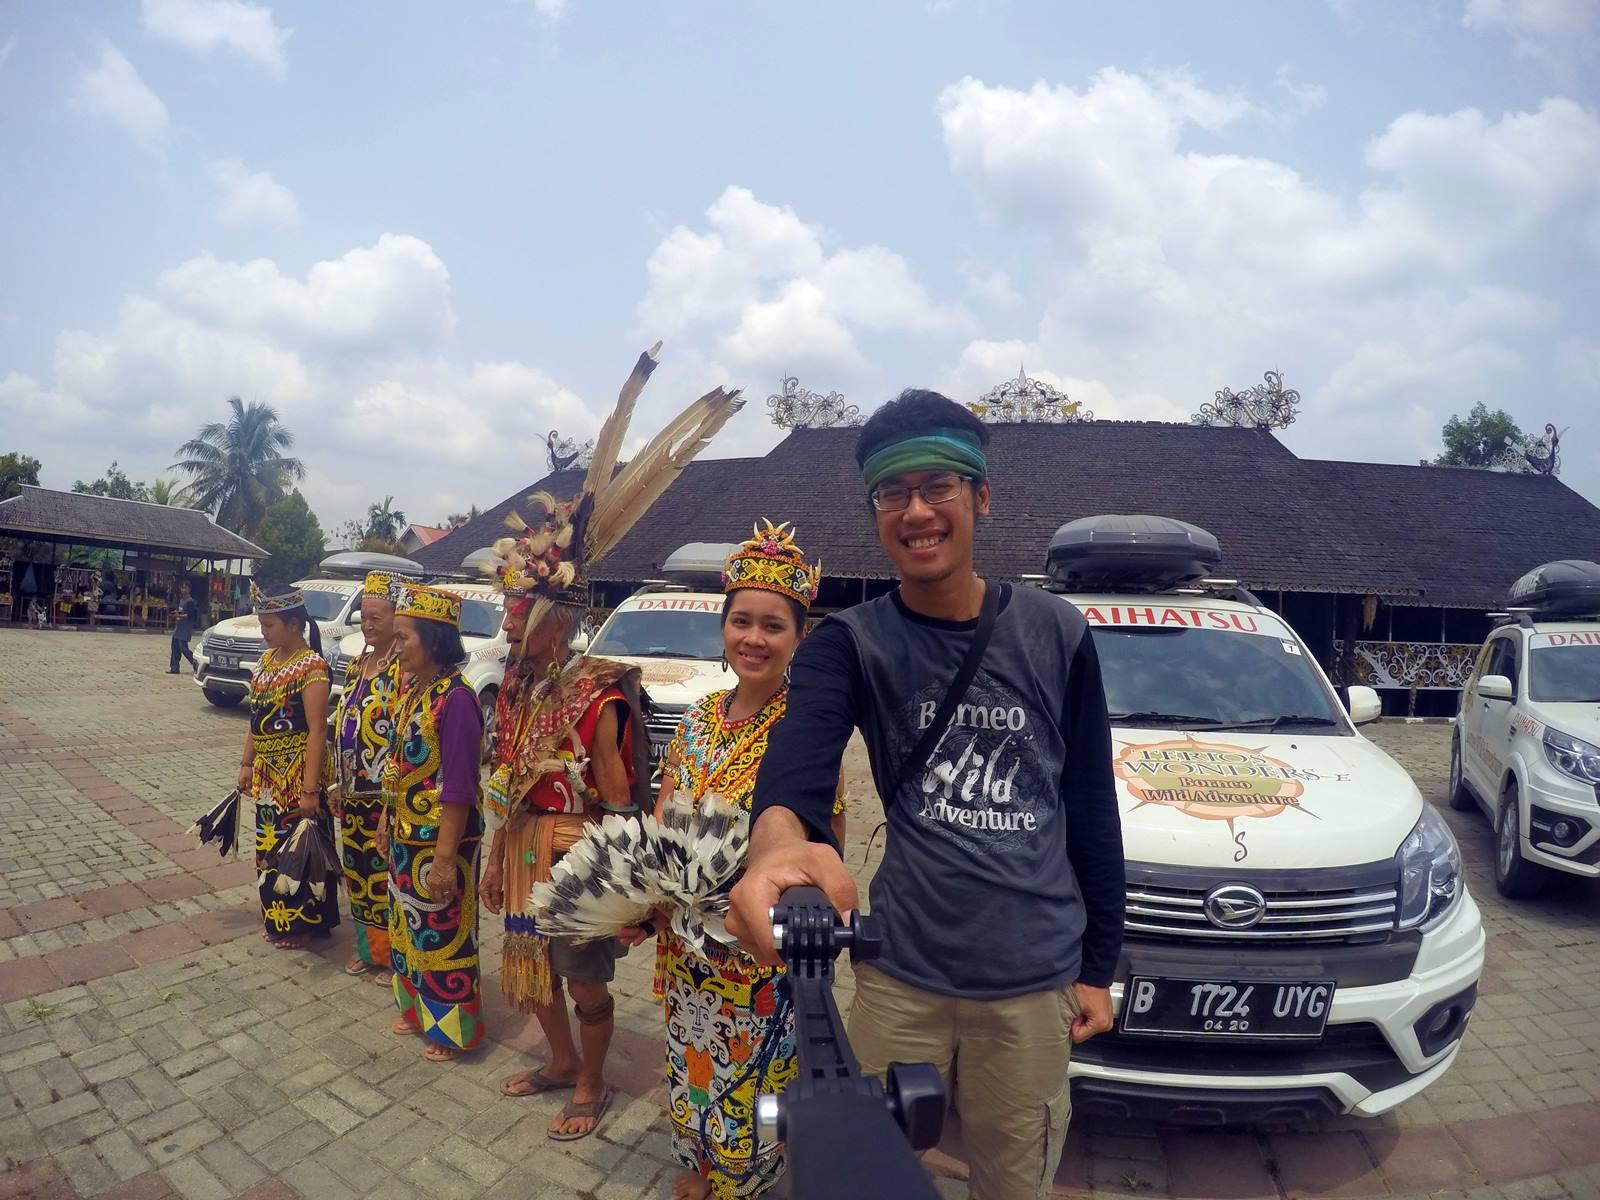 Alunan Musik Suku Dayak Kenyah Pampang Catperku Desa Budaya Kota